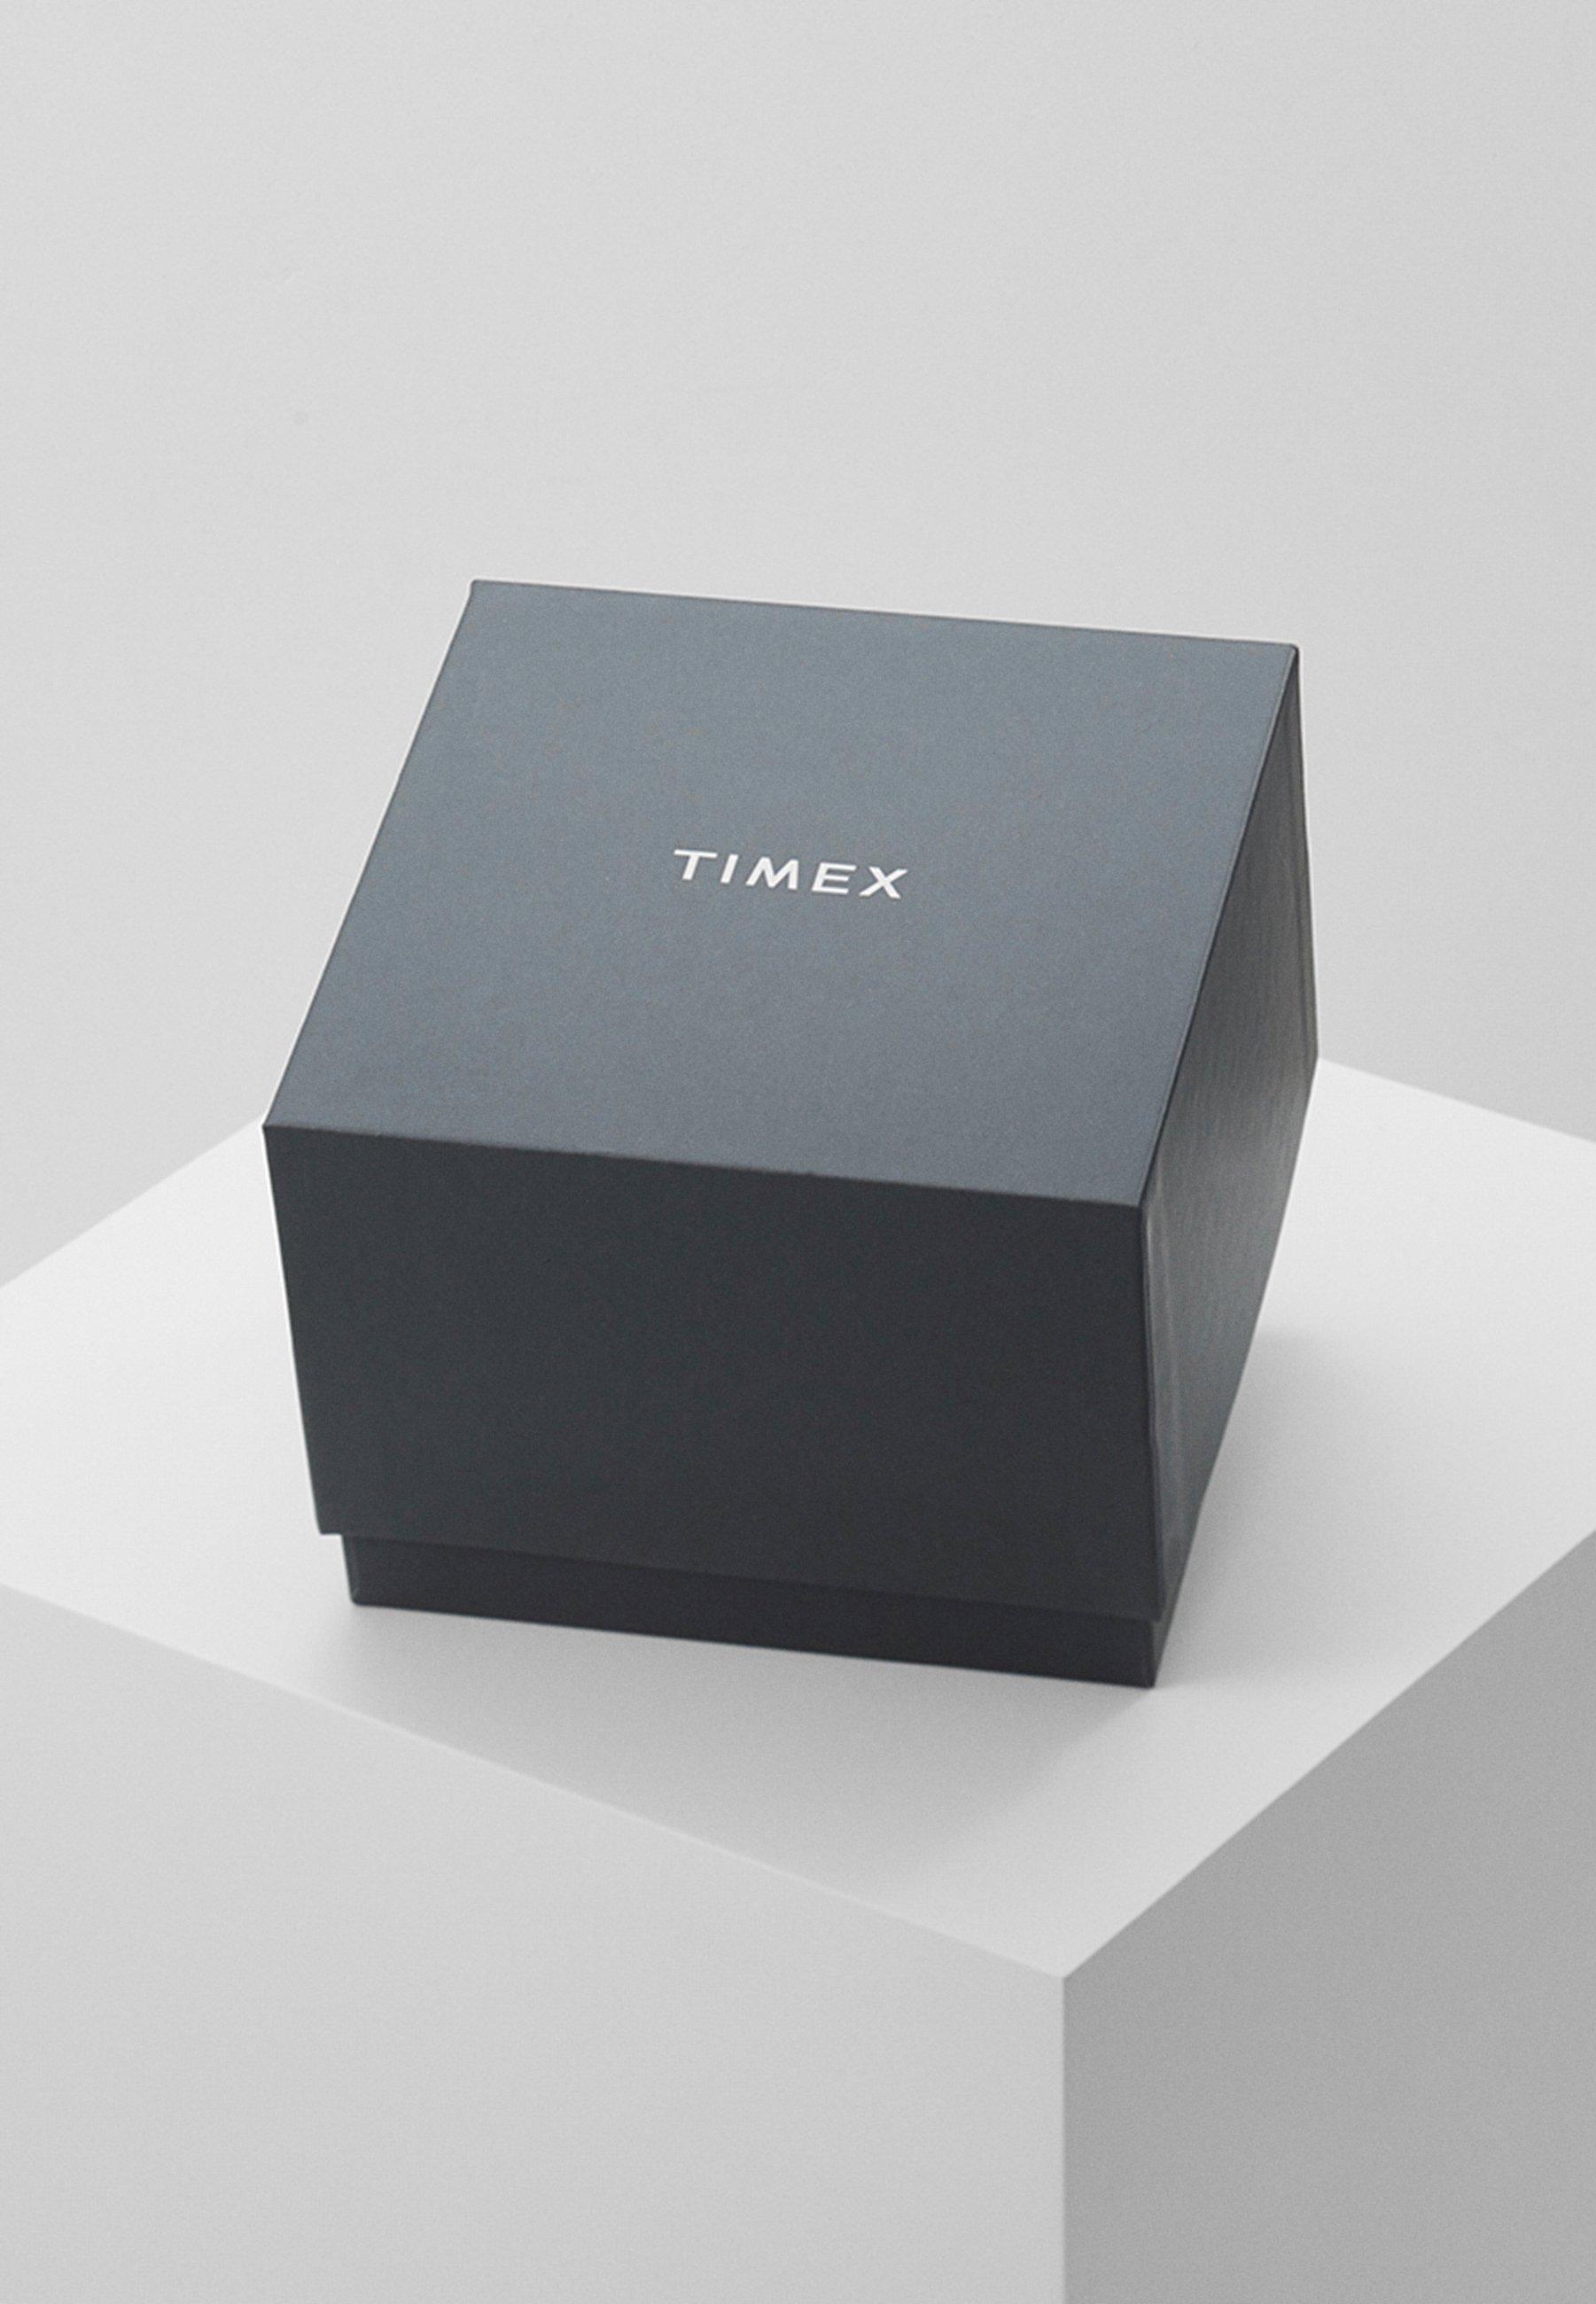 Timex WOMEN'S NORWAY - Horloge - gold-coloured - Dameshorloge Populair